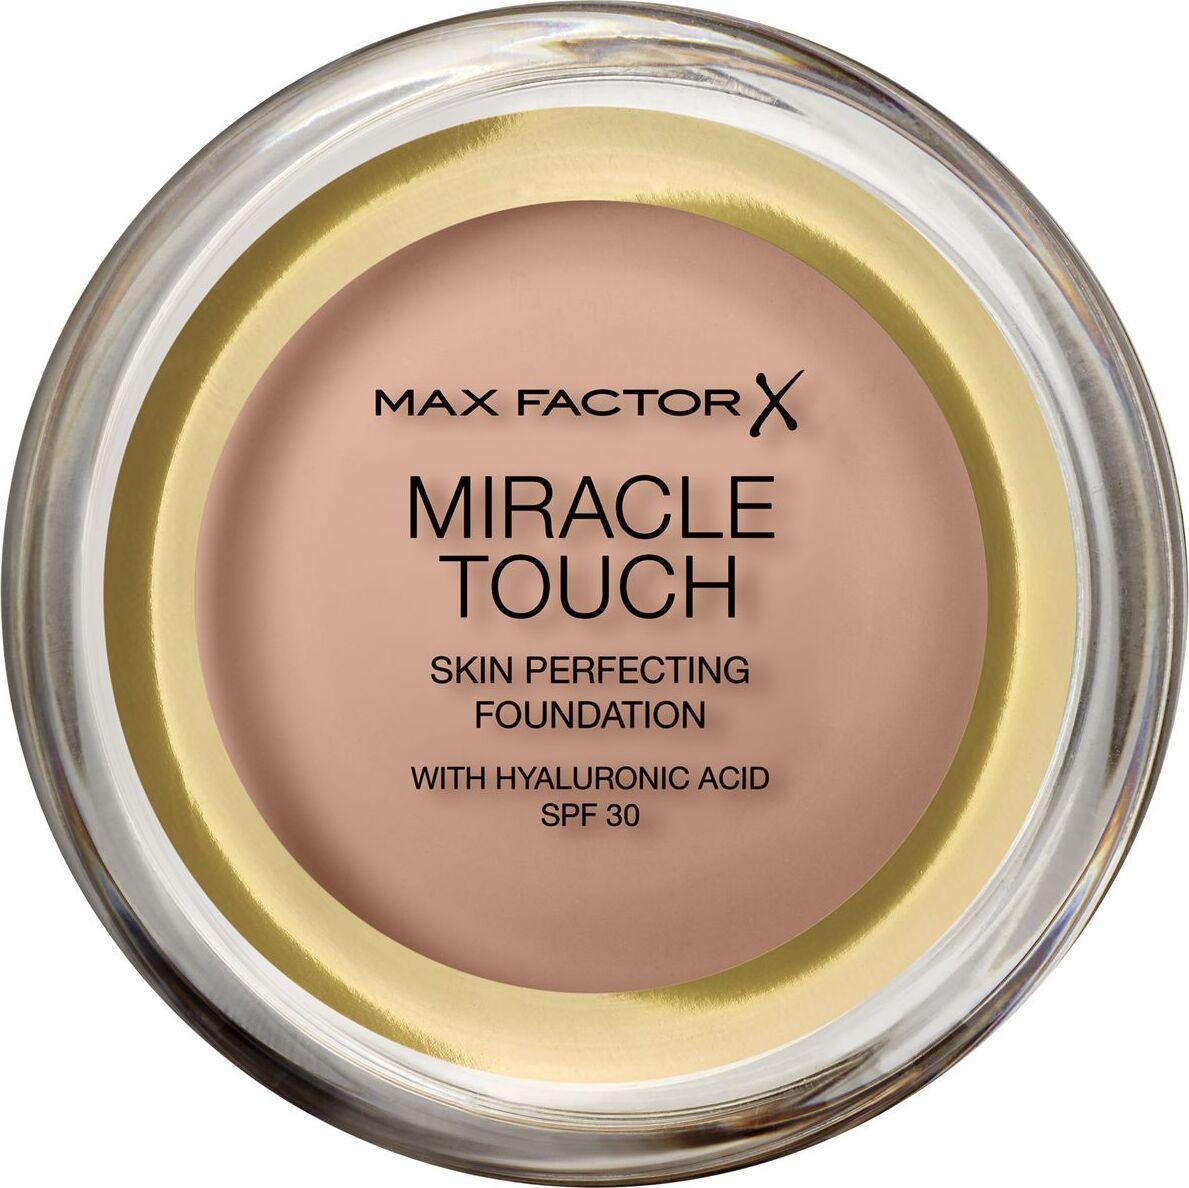 Тональная основа Max Factor Miracle Touch, SPF 30, тон 70 Natural, 11 мл основа под макияж max factor miracle prep colour correcting cooling тон green 30 мл